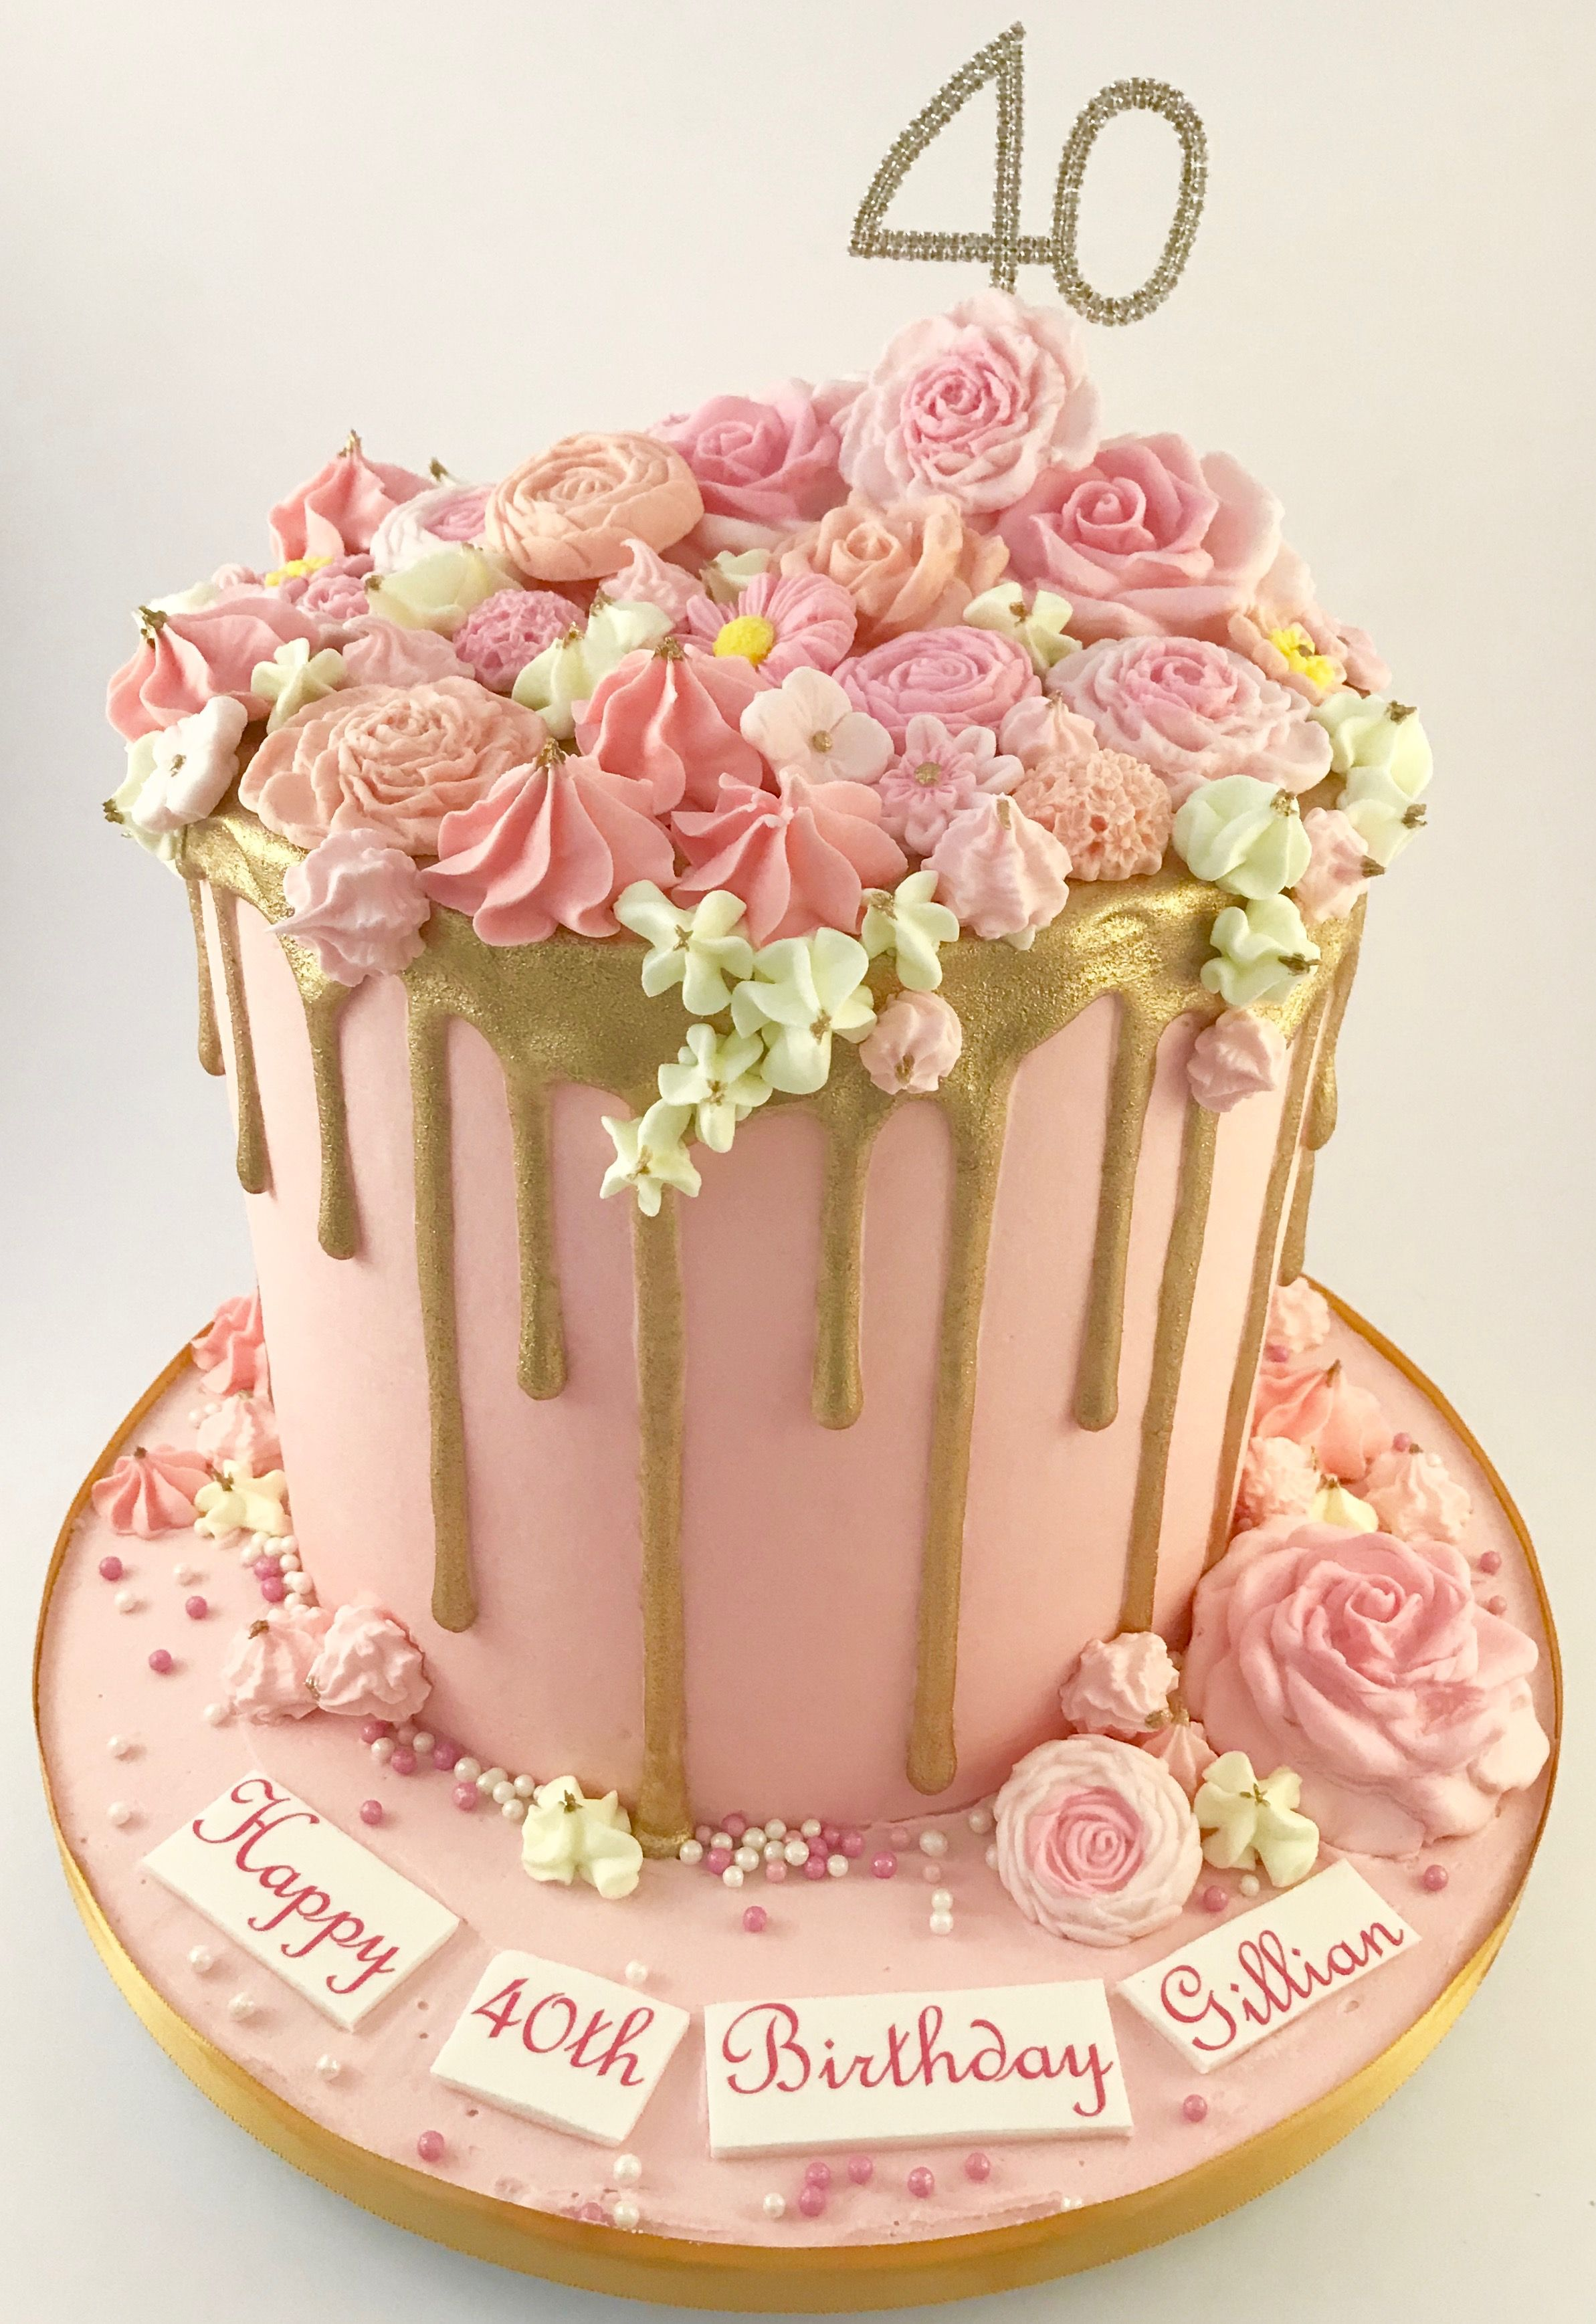 Cake Ideas For Women : ideas, women, Cakes